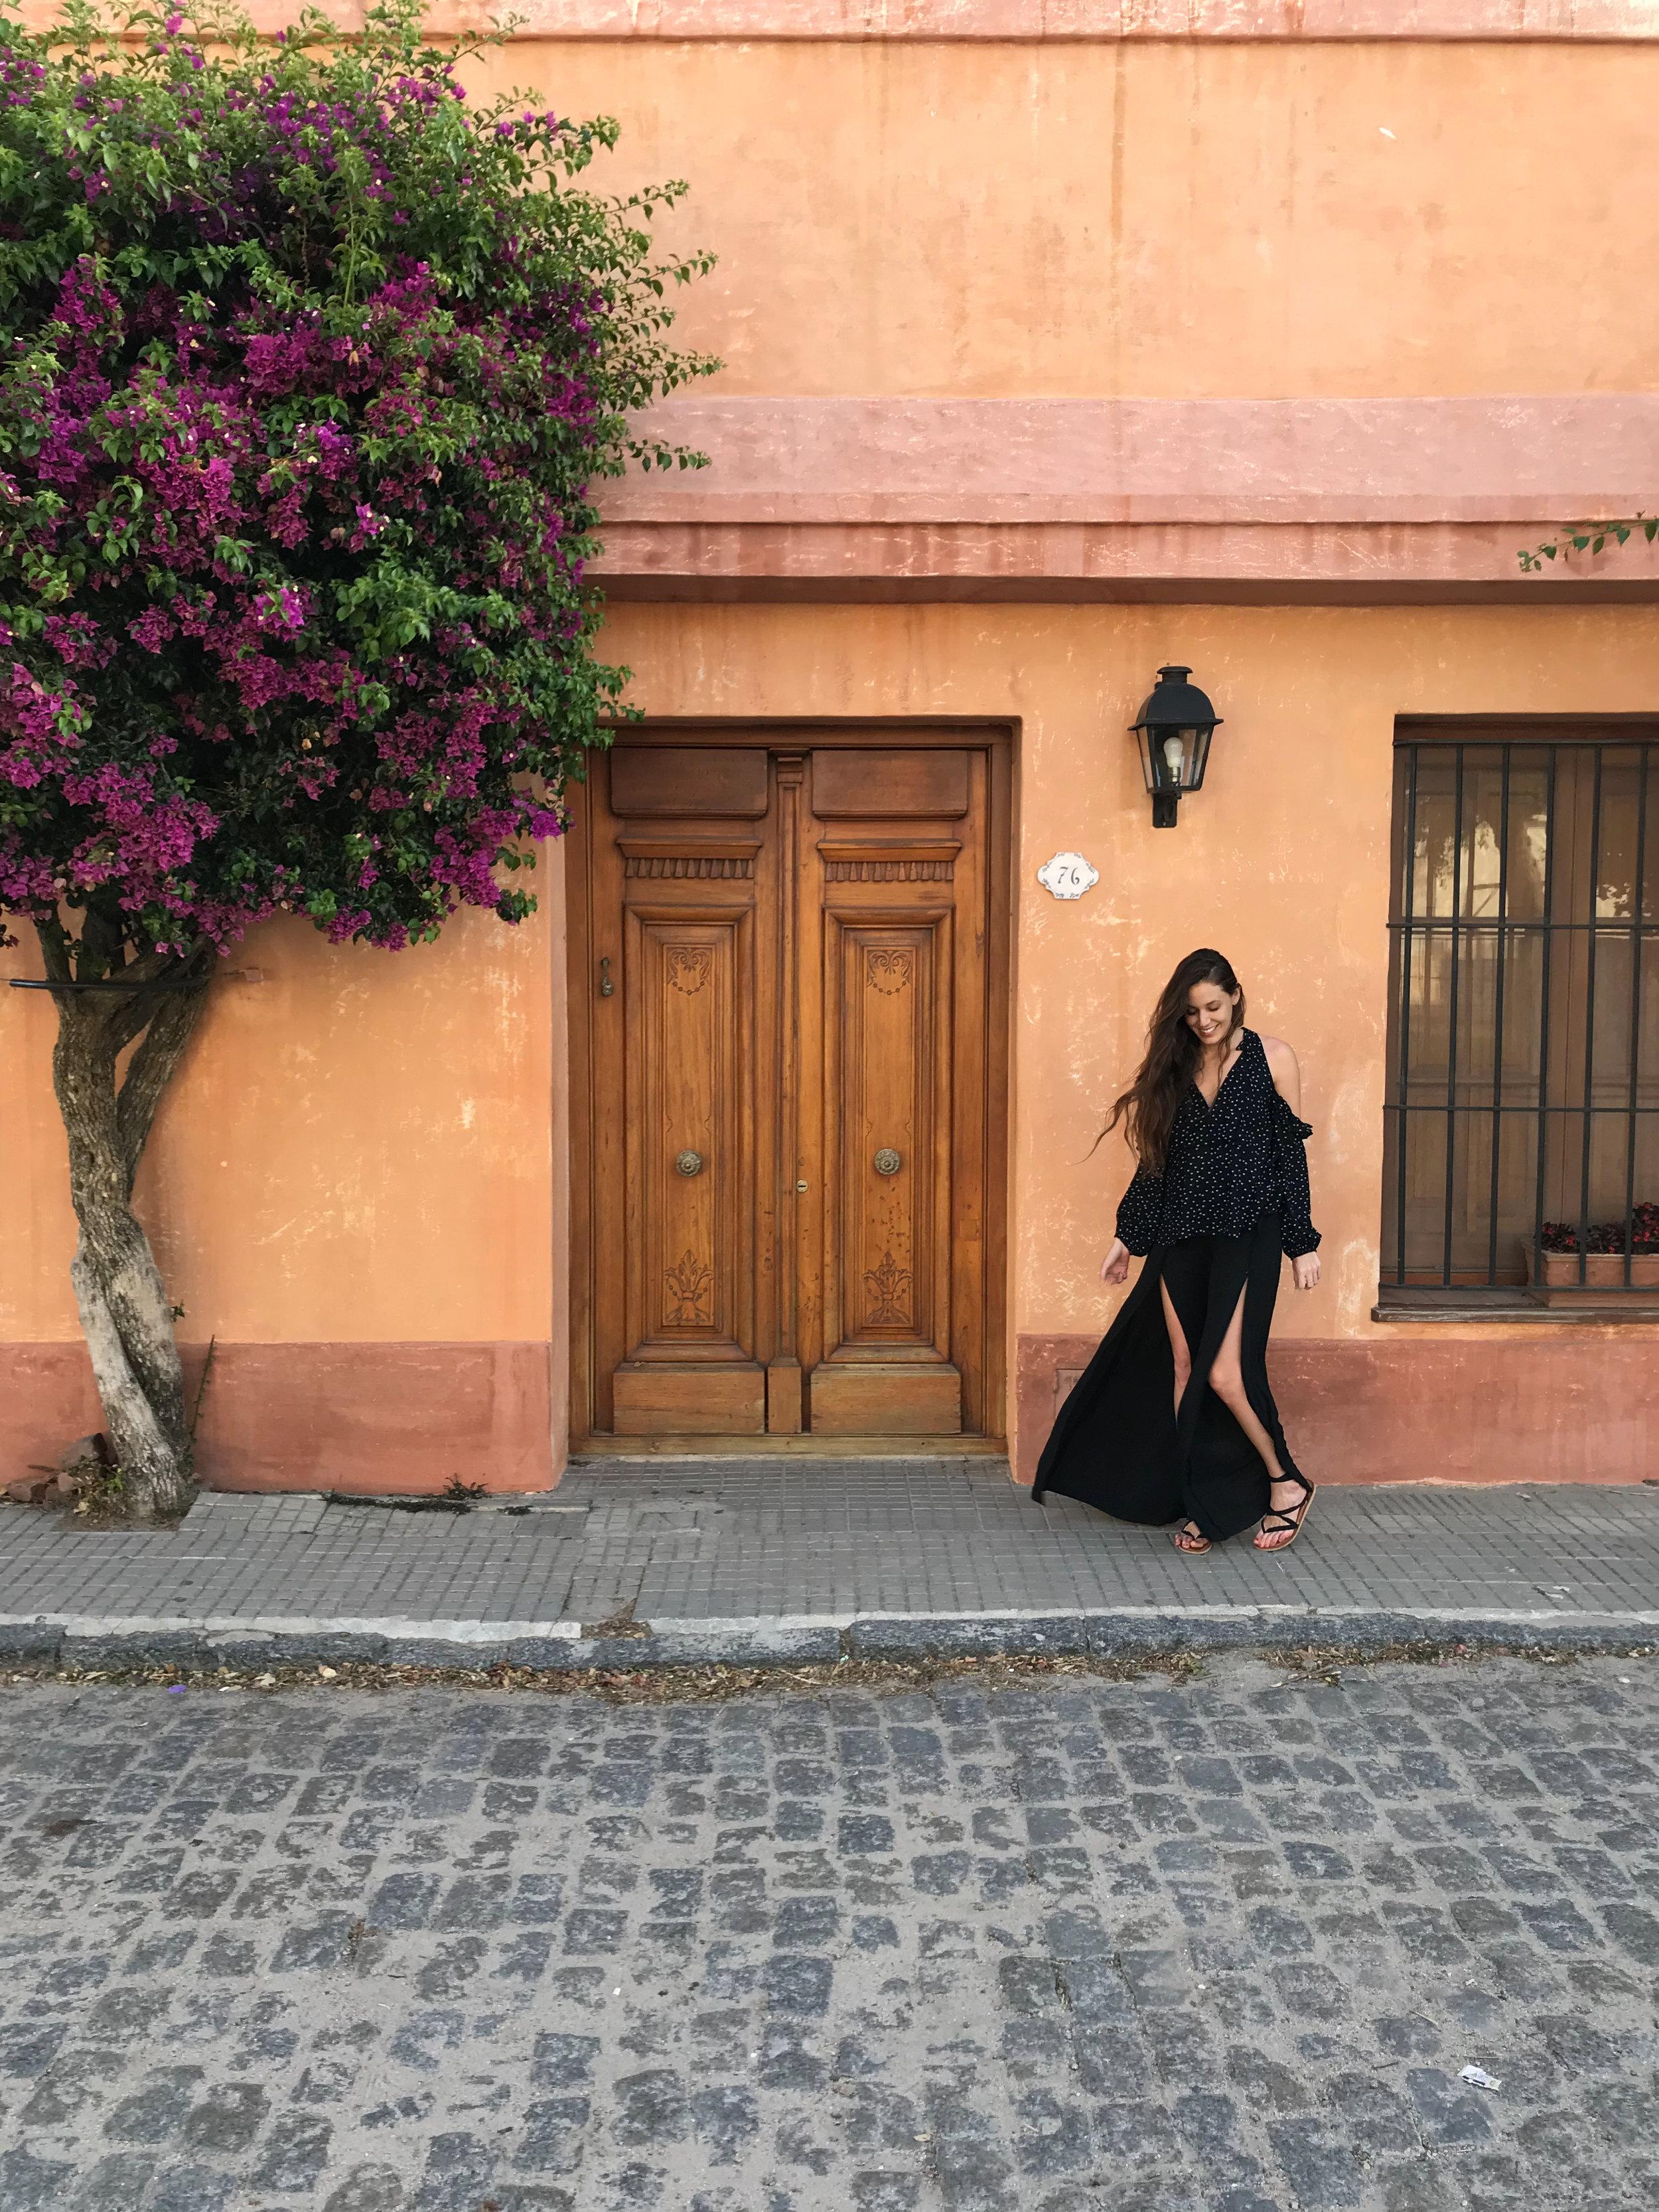 Colonia del Sacramento Uruguay.JPEG